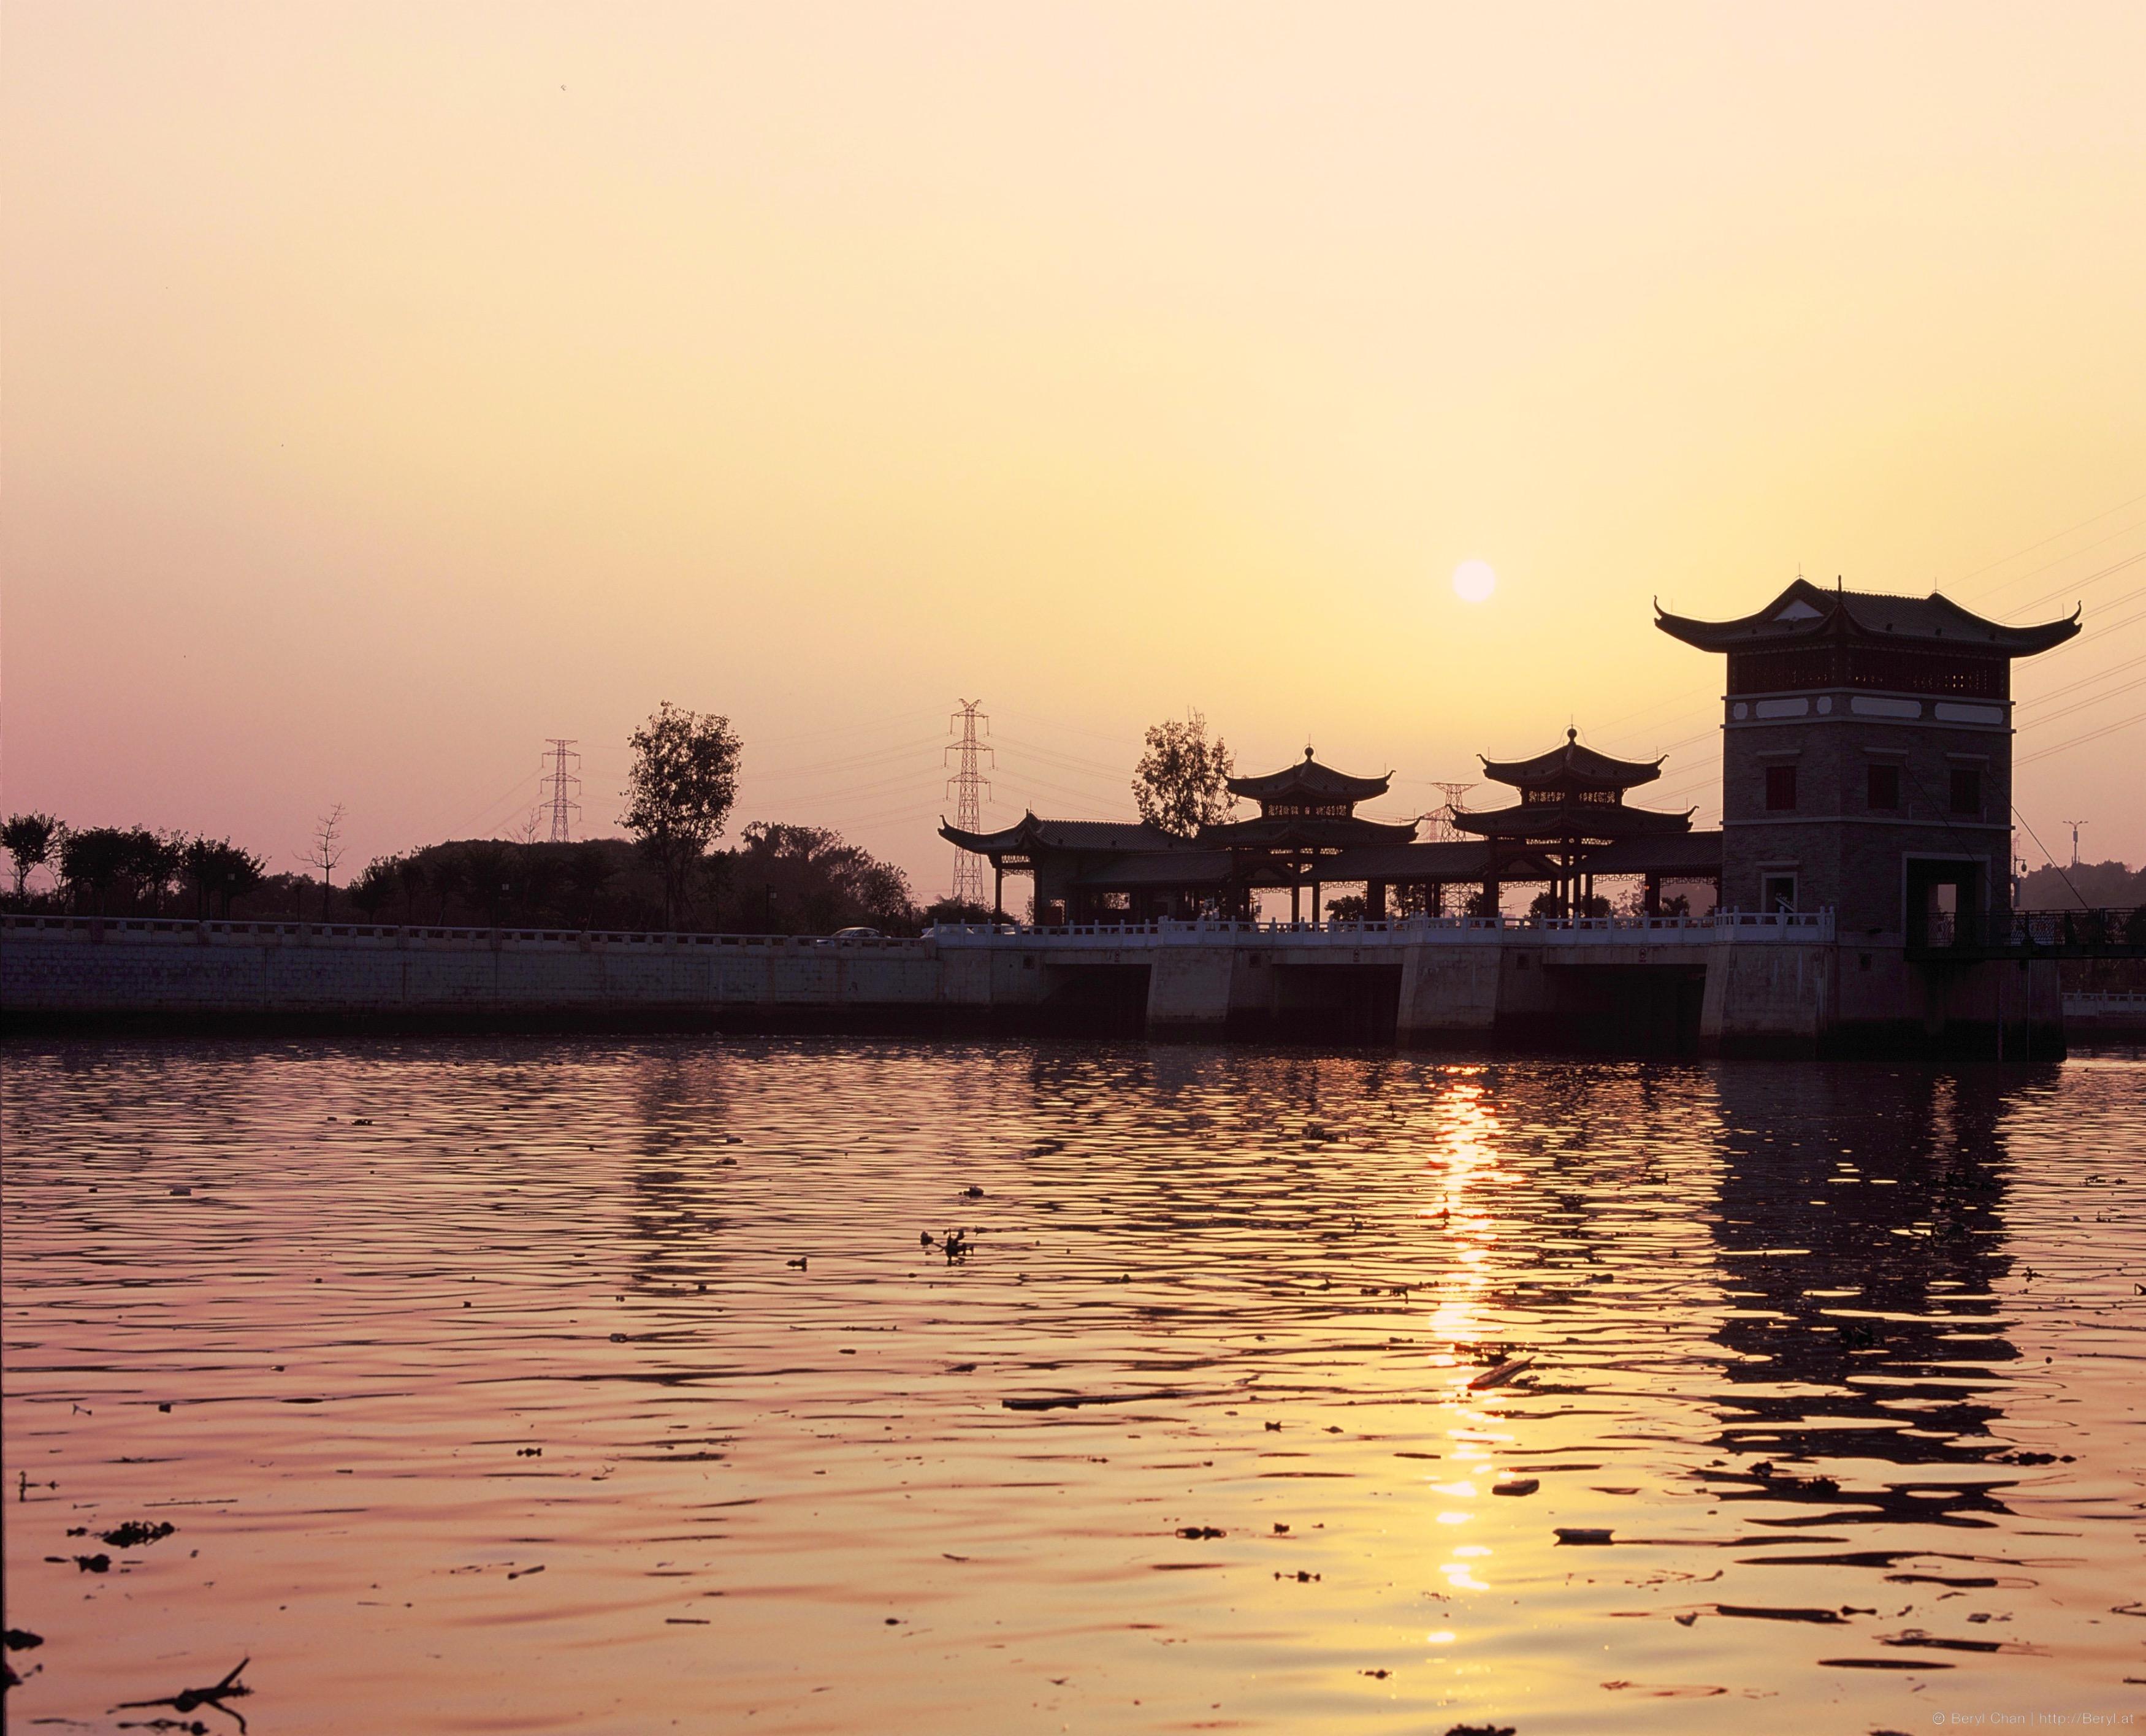 Landscape Sea Sunrise Sunset Vintage Morning Dawn River Film Analog Dusk Fujifilm Evening Golden Reflection Colourful